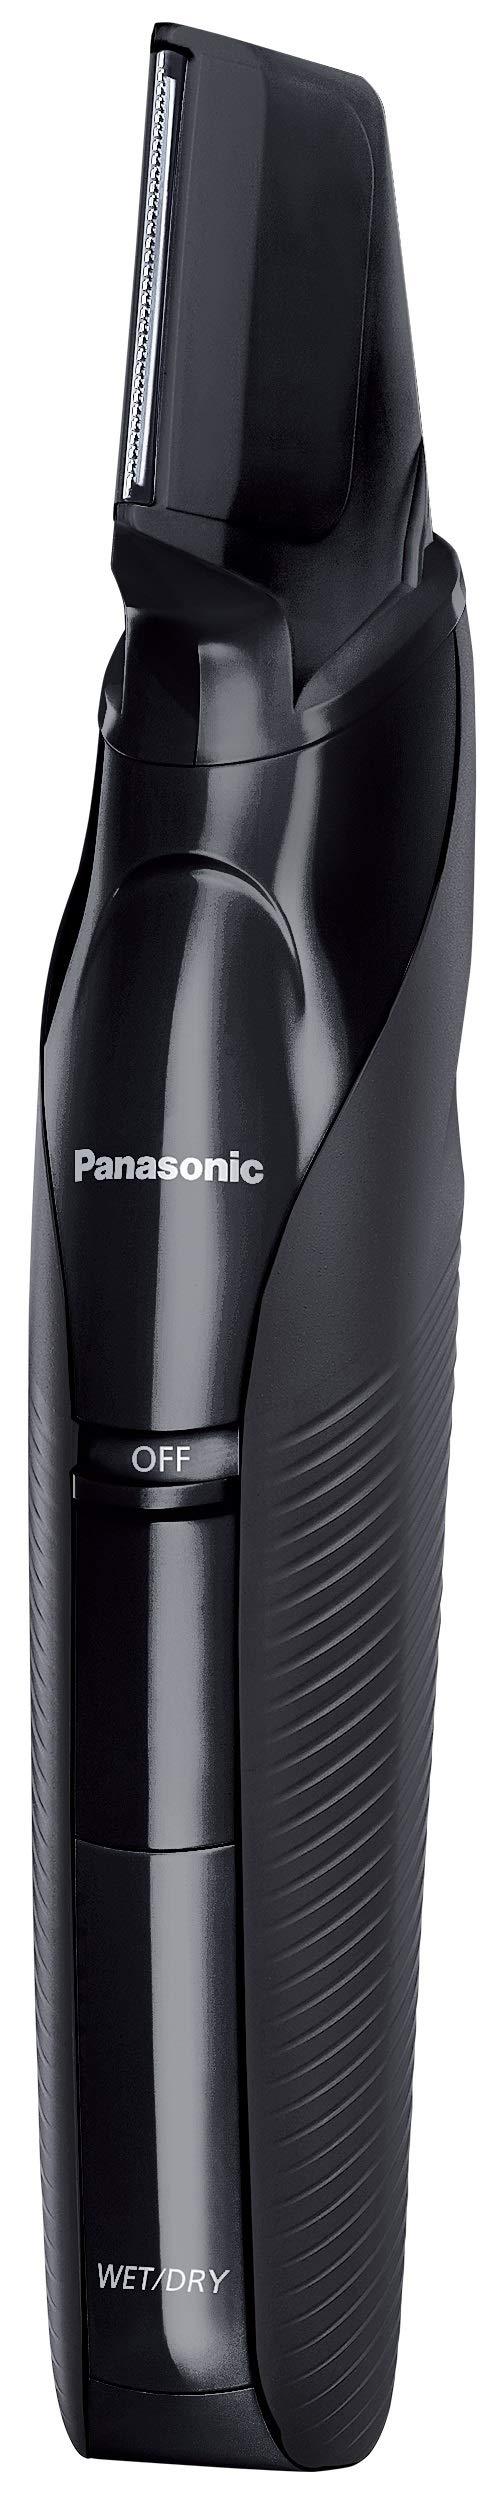 PANASONIC ER-GK 71 K [body trimmer] by Panasonic